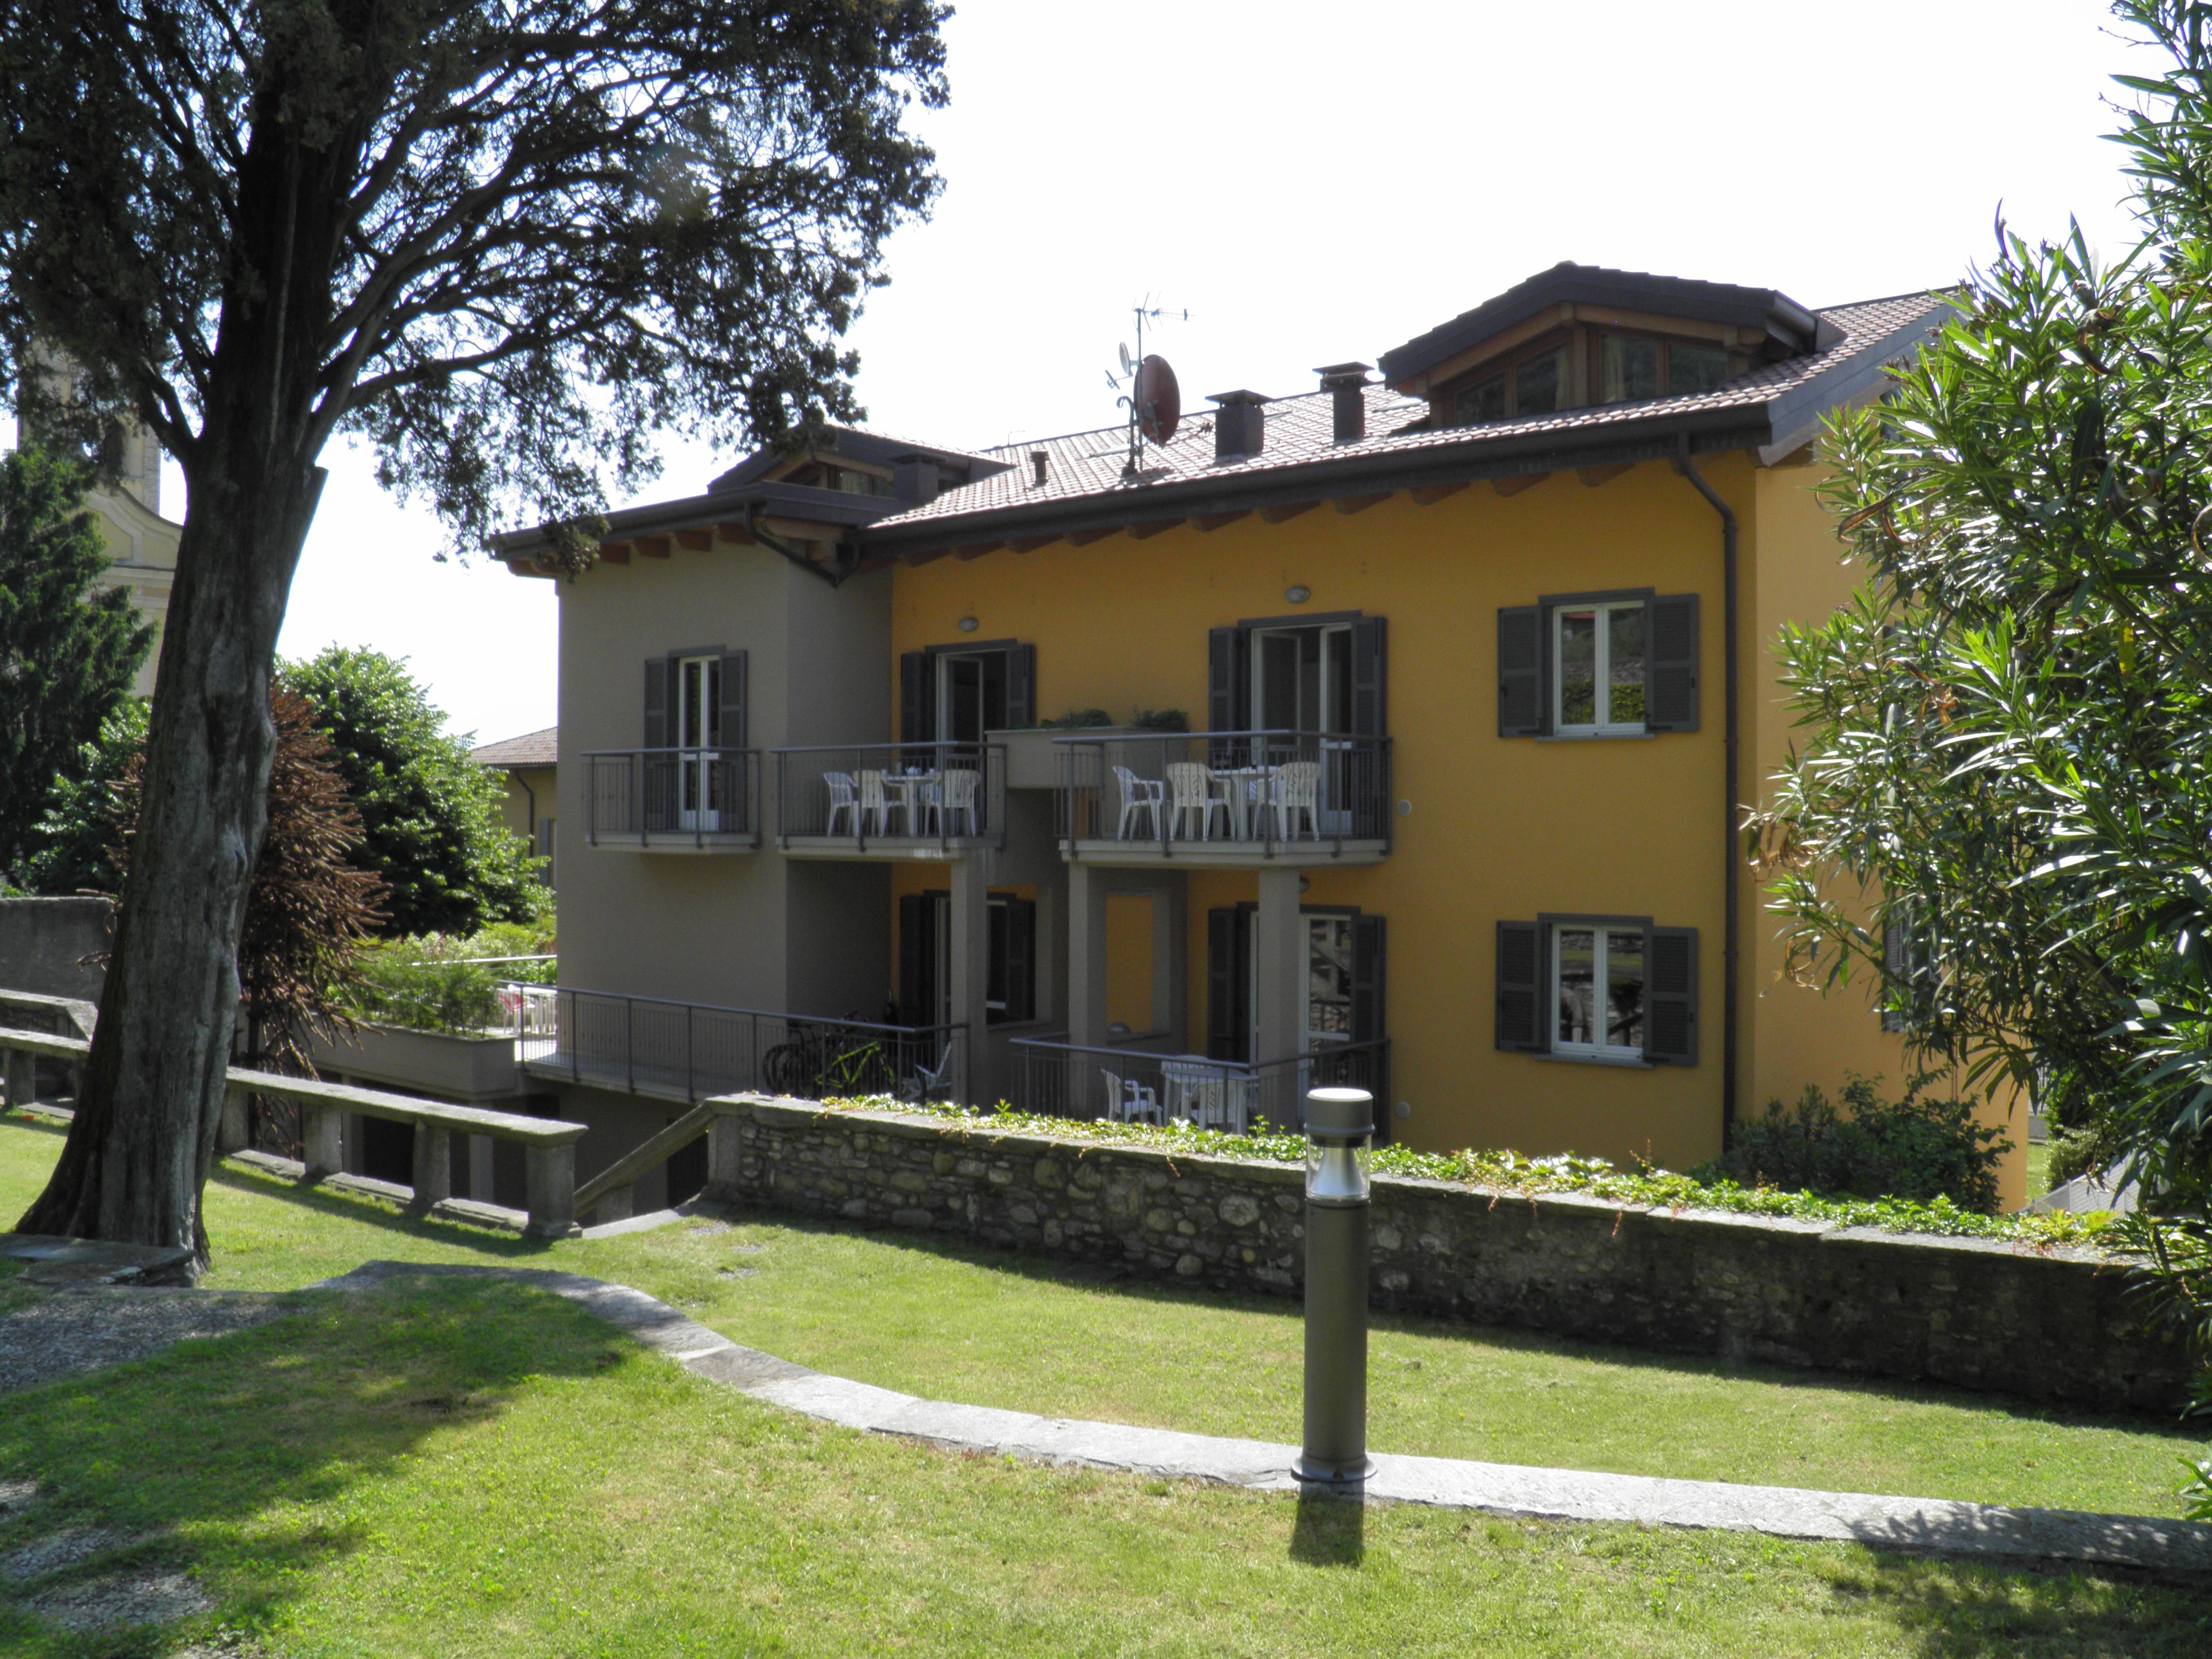 Bilder von Lake Como Apartment Cedro_207_Domaso_56_Haus